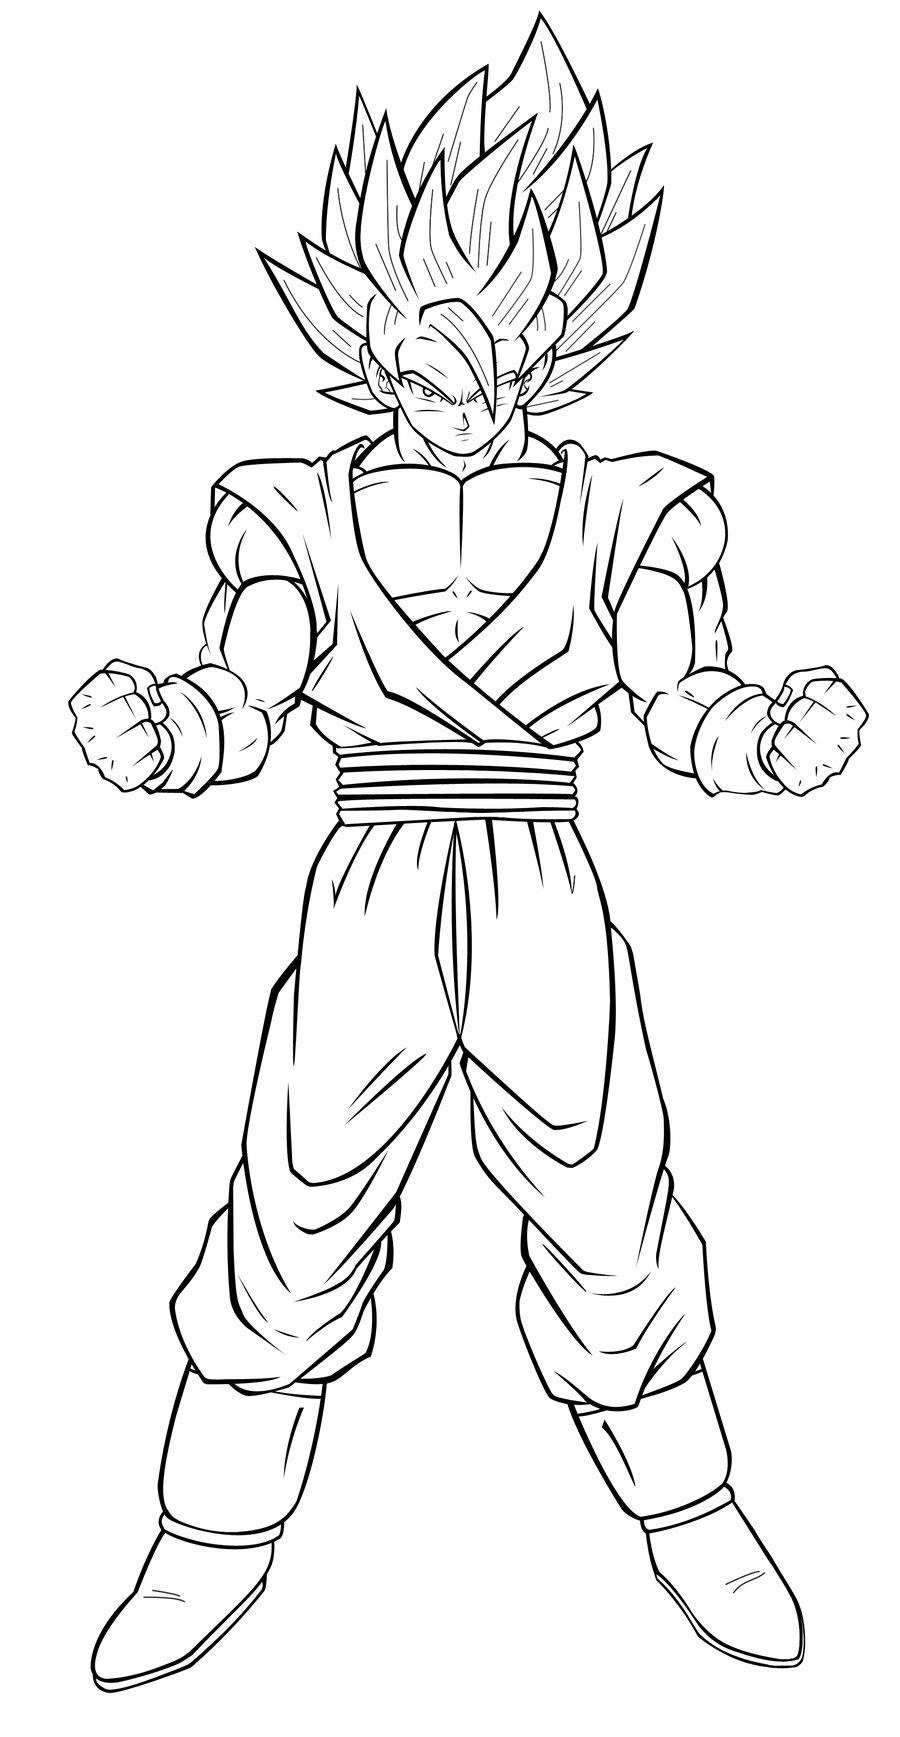 Goku Ssj Drawing At Getdrawingscom Free For Personal Use Goku Ssj